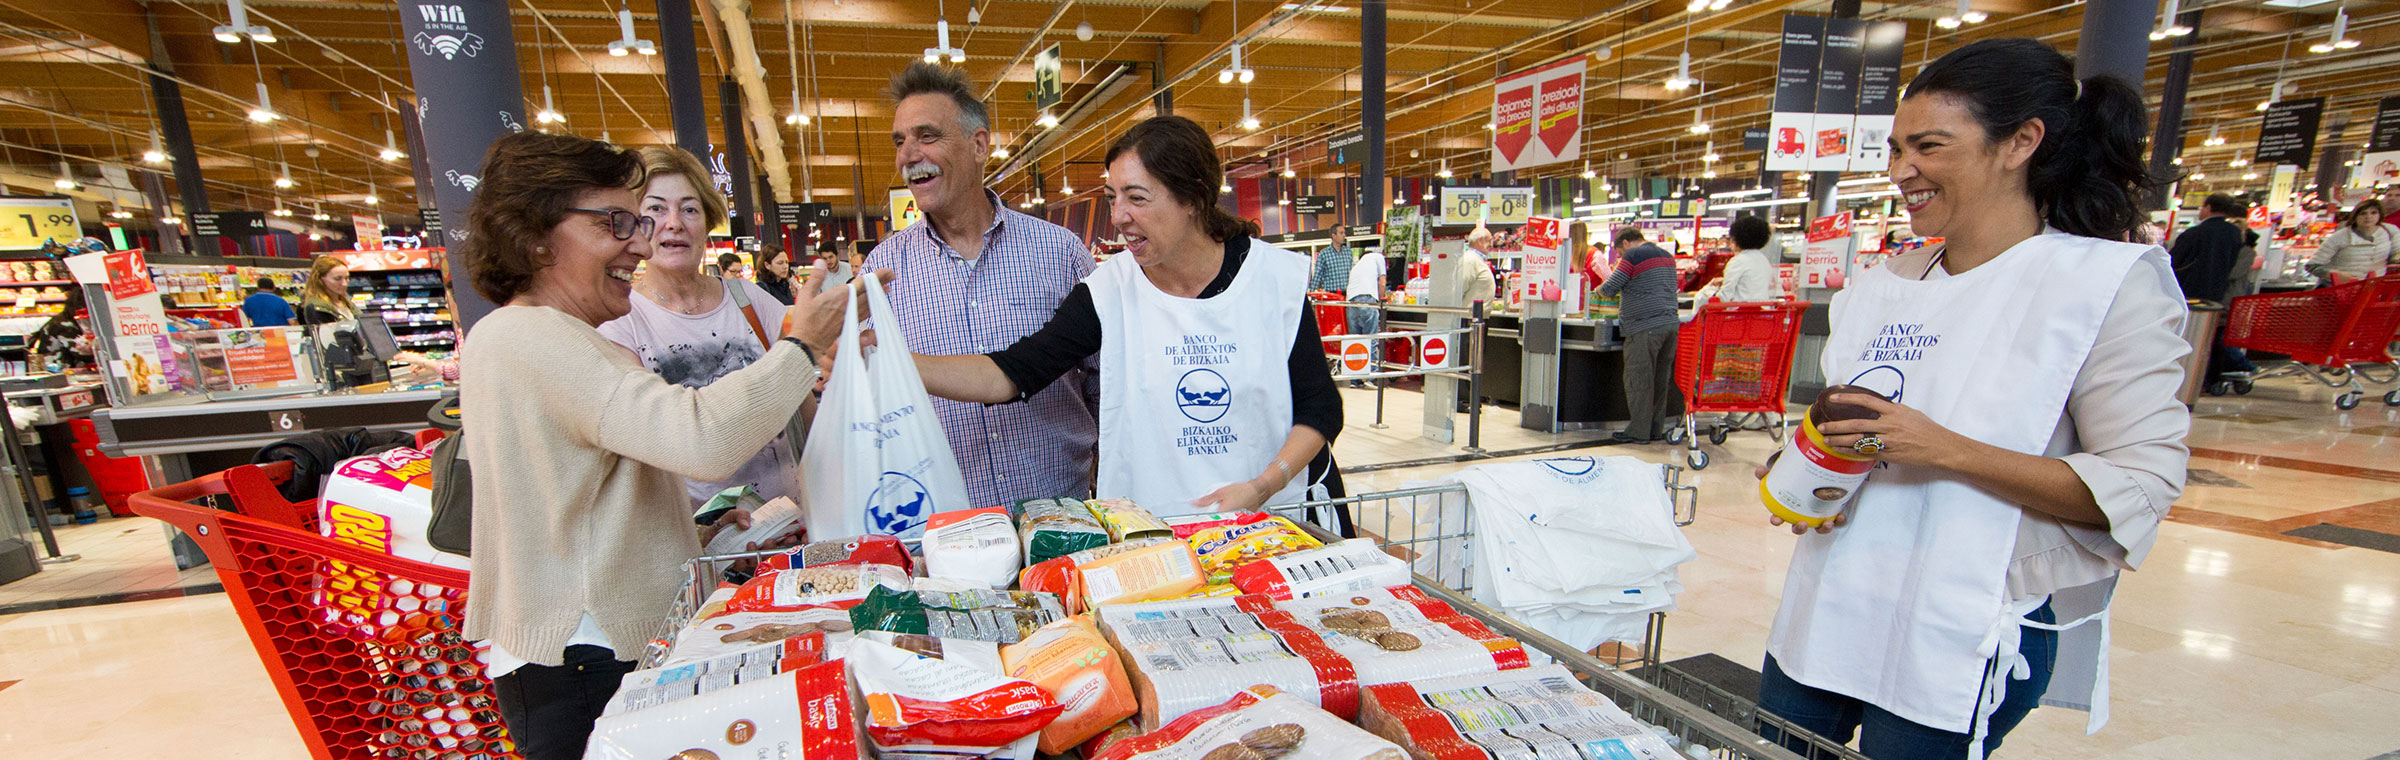 Voluntarias banco de alimentos en hipermercado Eroski